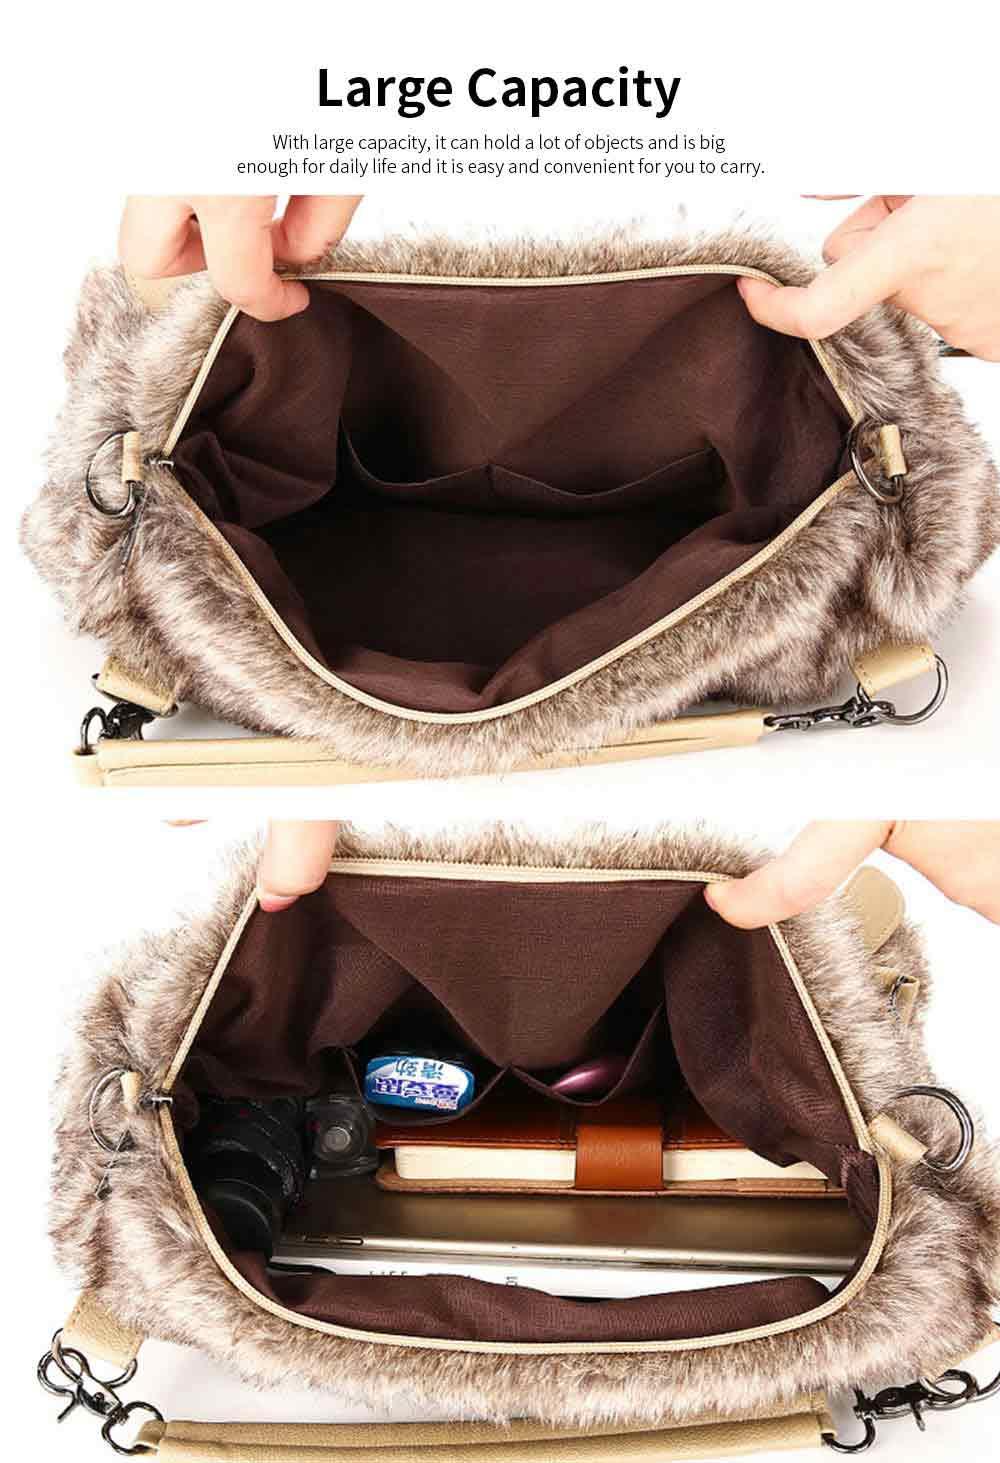 Luxury Fashion Warm Plush Women Bag with Three Methods of Use, Tote Messenger Crossbody Shoulder Bag Satchel Handbag 4